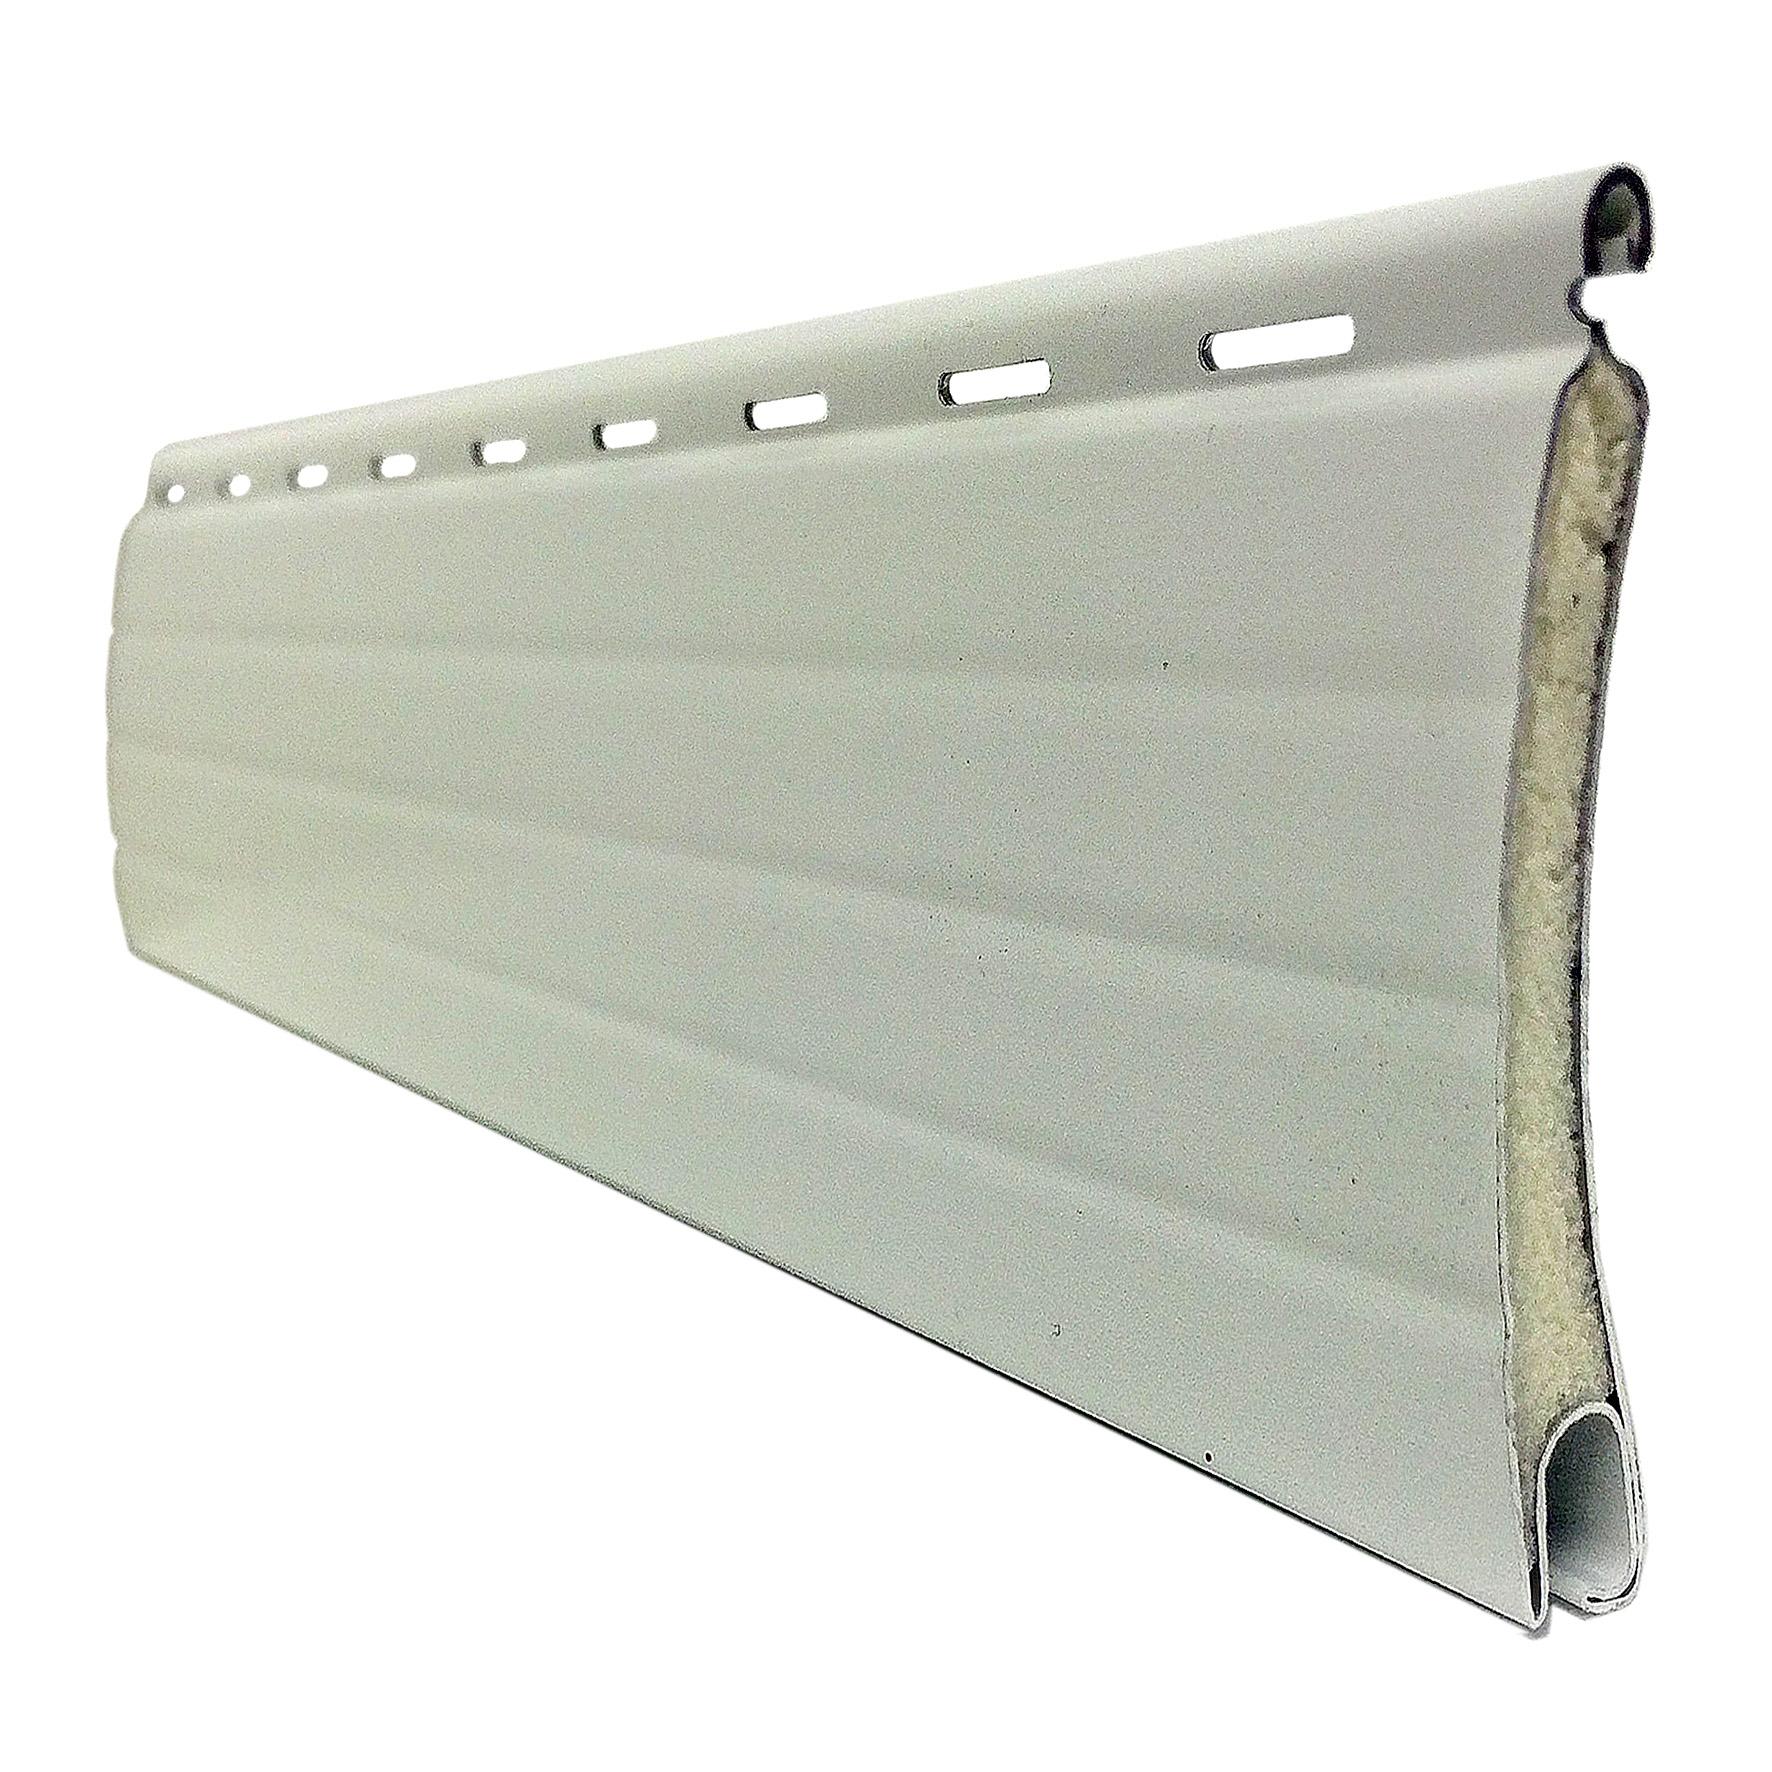 aluroll-m411-security-shutter-slat-profile